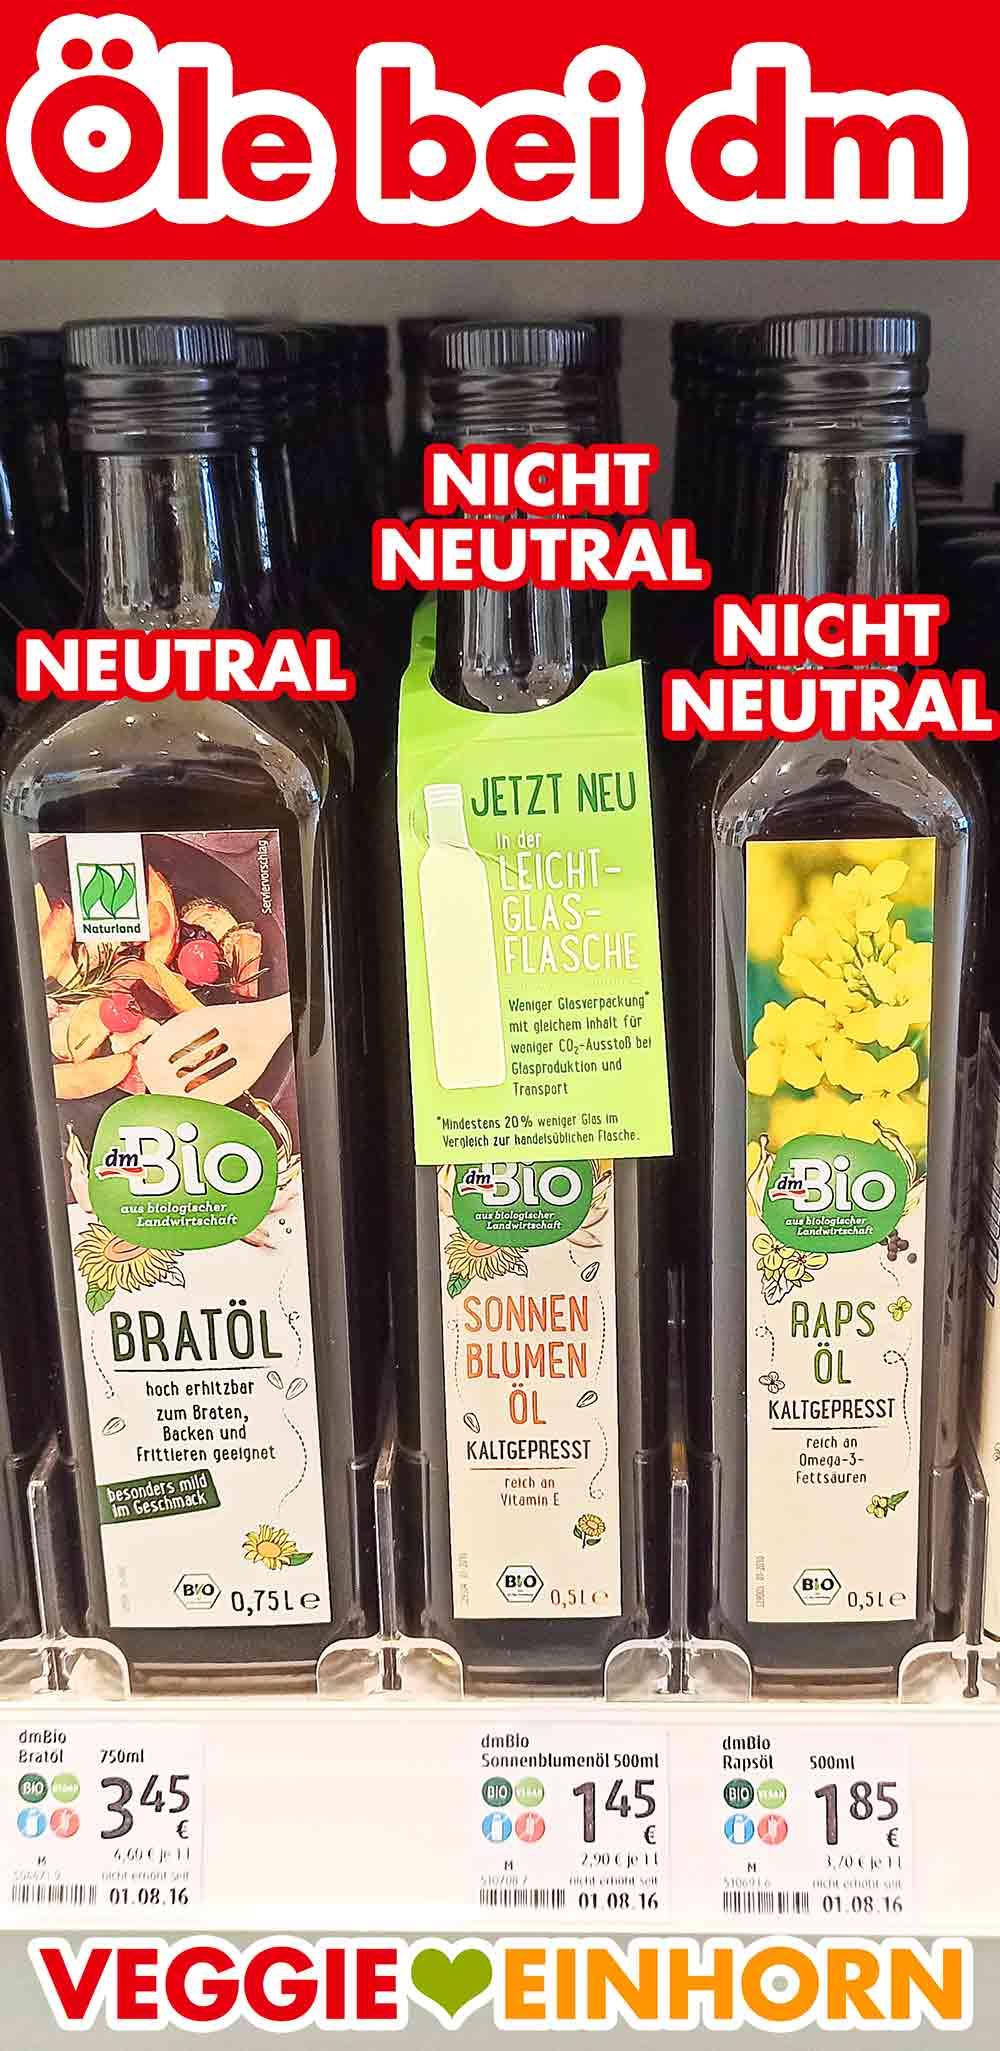 Bratöl, kaltgepresstes Sonnenblumenöl und natives Rapsöl im Regal bei dm